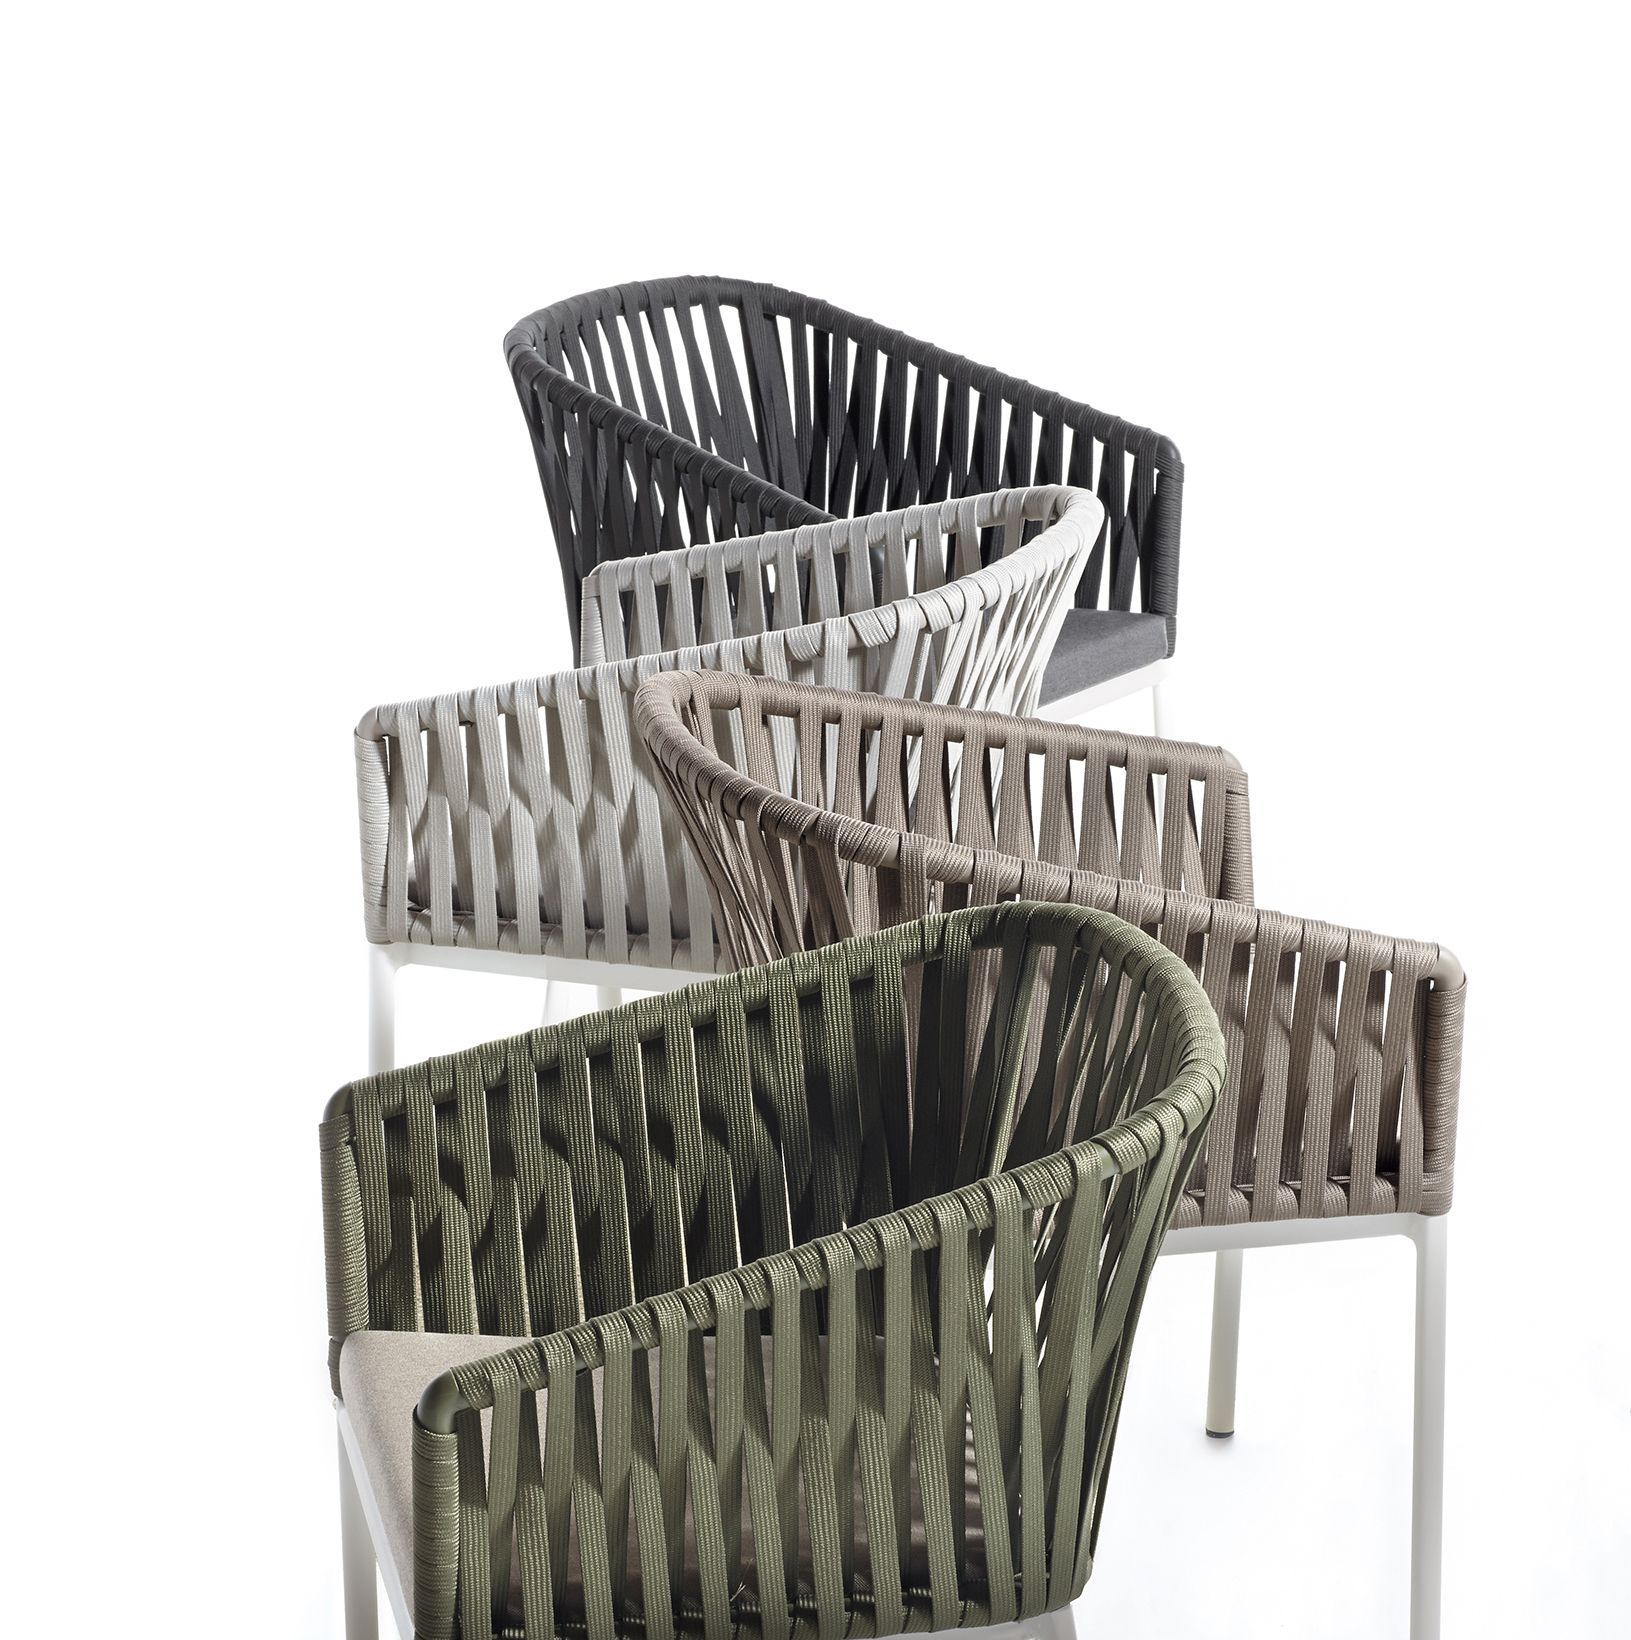 Bitta modern patio furniture by rodolfo dordoni - Kettal Bitta New Rope Colors Design By Rodolfo Dordoni Outdoor Furnitureoutdoor